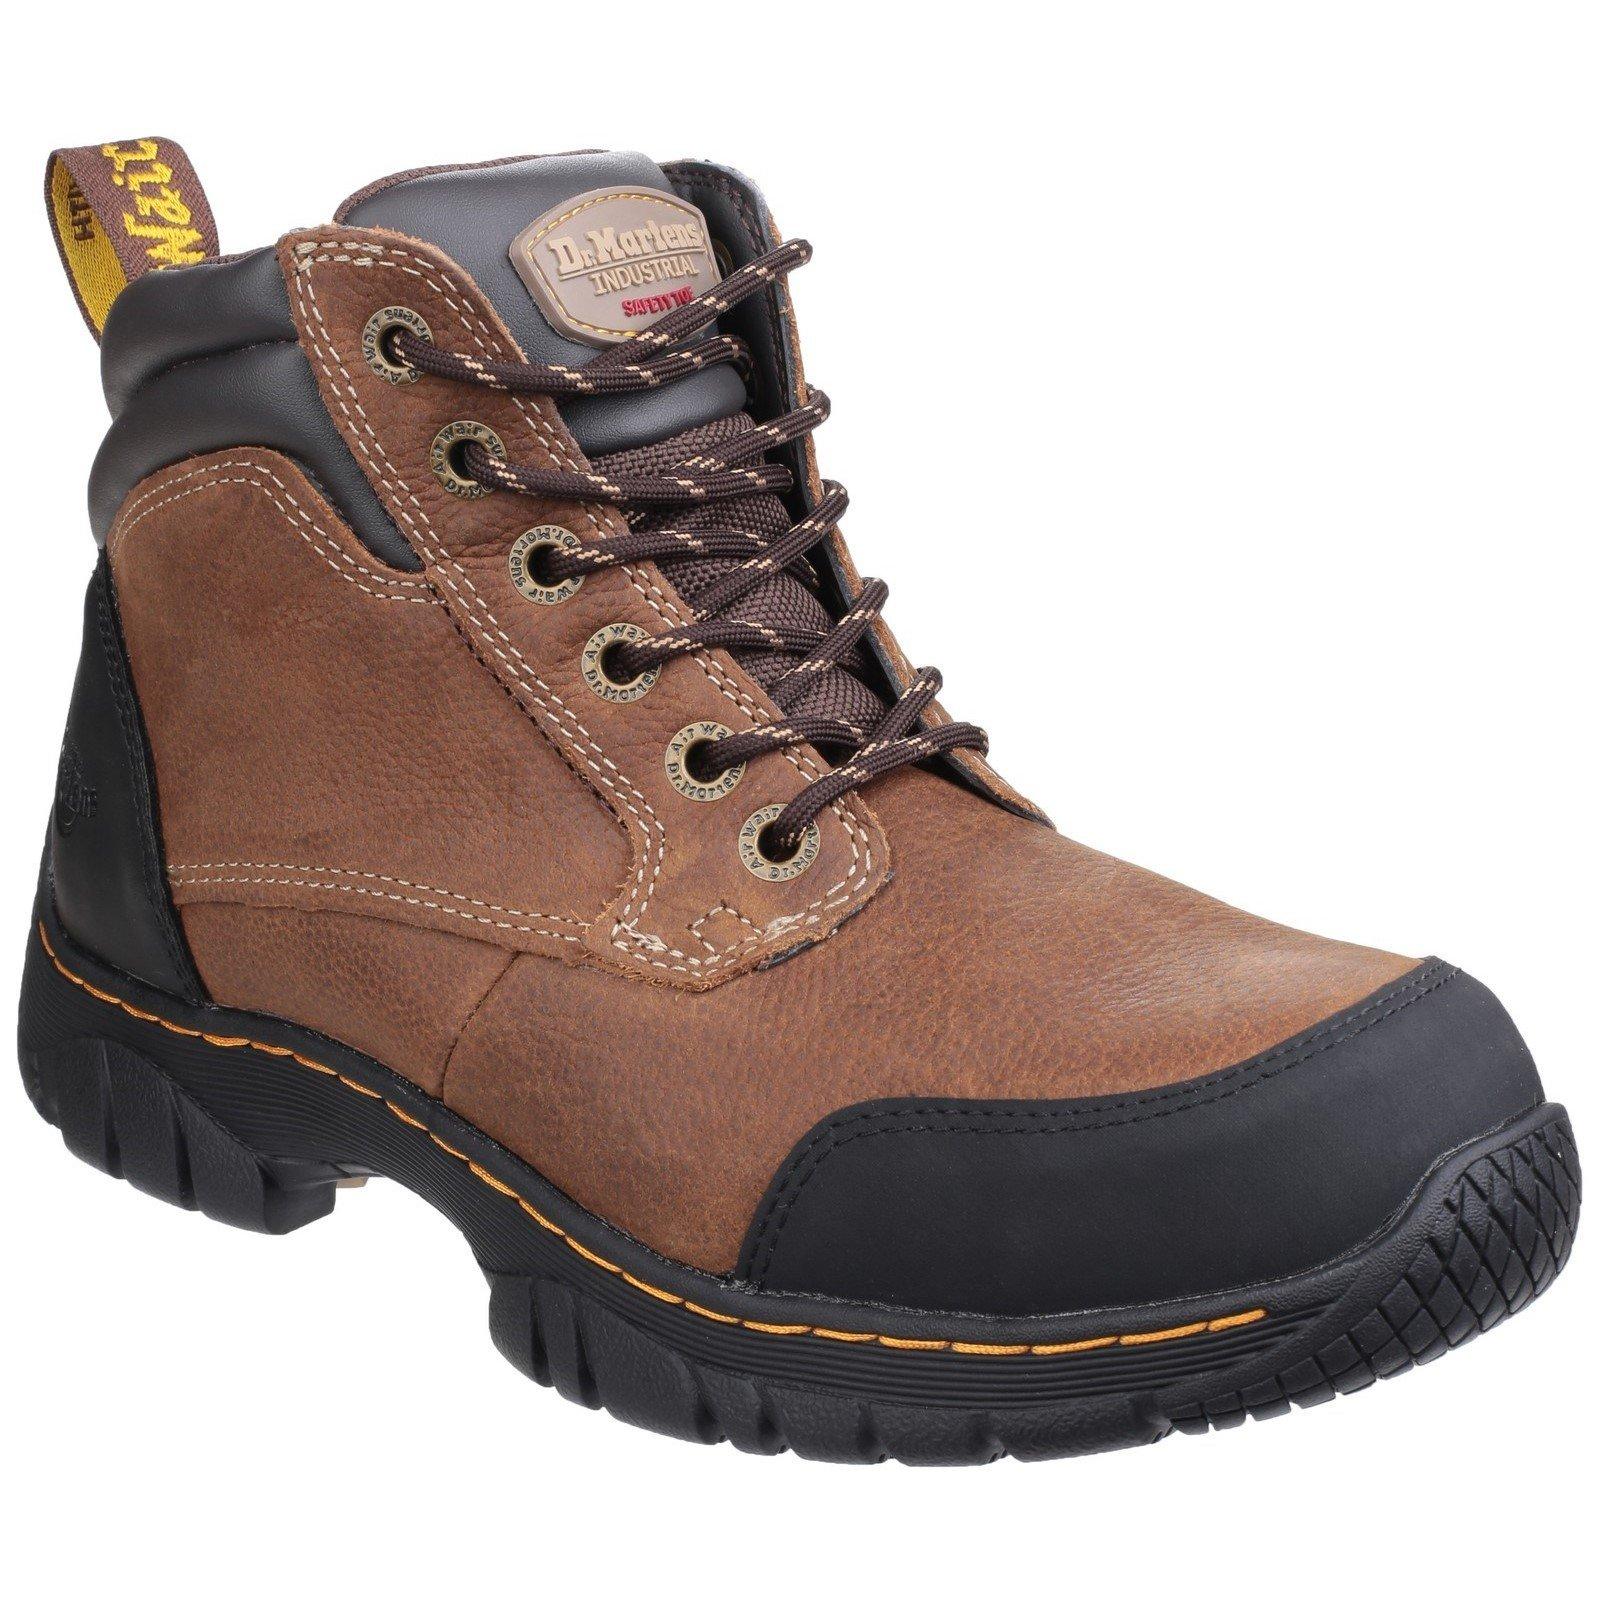 Dr Martens Unisex Riverton SB Lace up Hiker Safety Boot 24534 - Brown 4